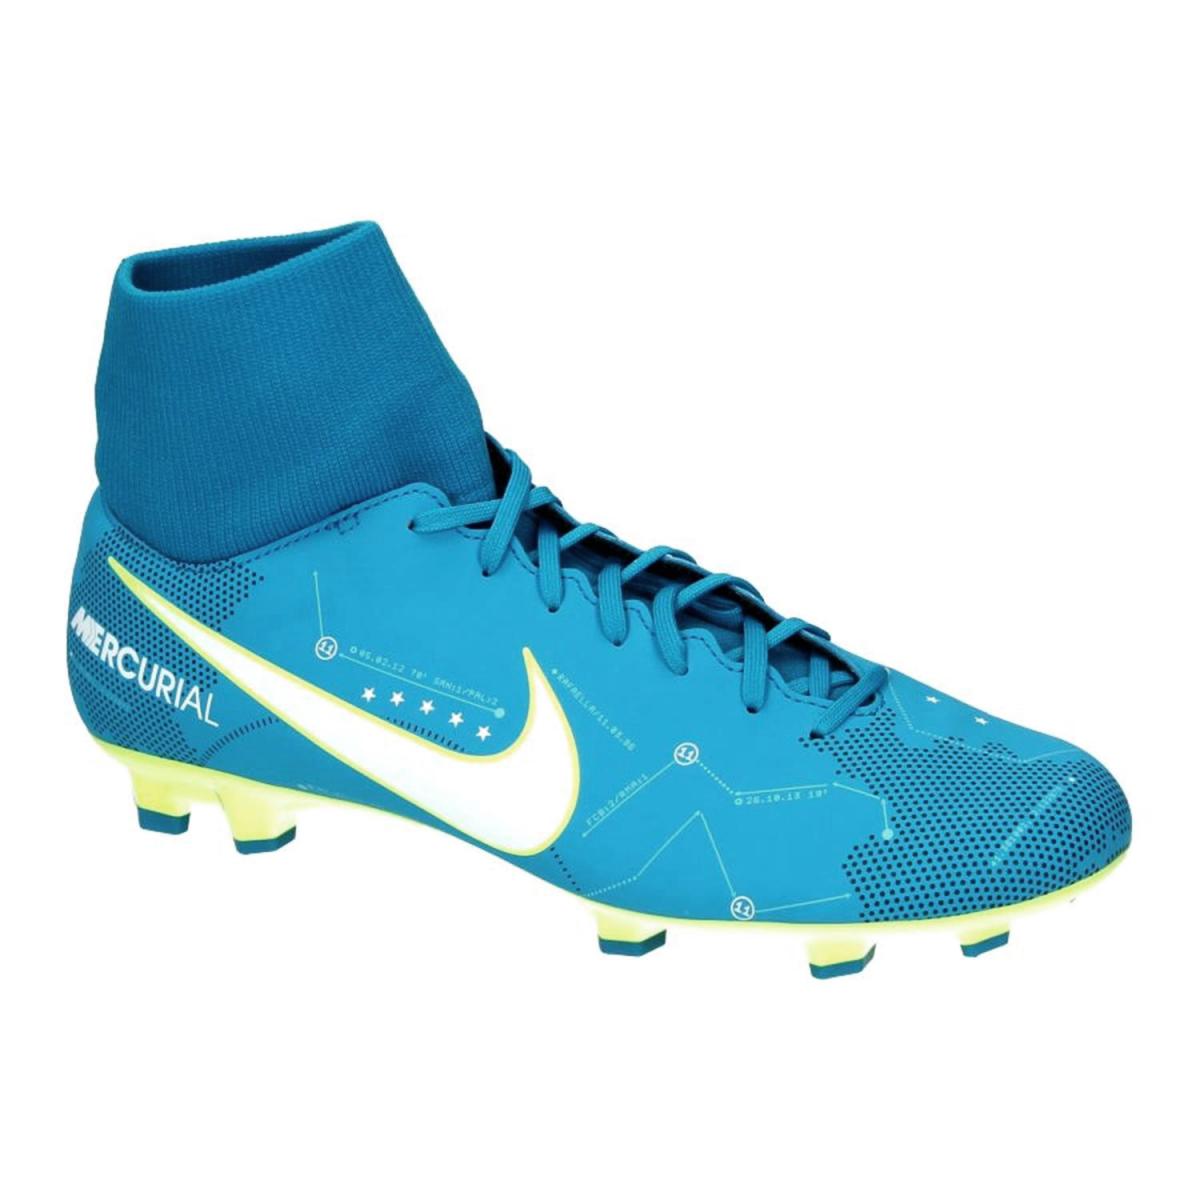 c594f3baa3ed5 Chuteira Nike Mercurial Victory VI DF Neymar Junior FG 921506-400  Azul Verde Limão